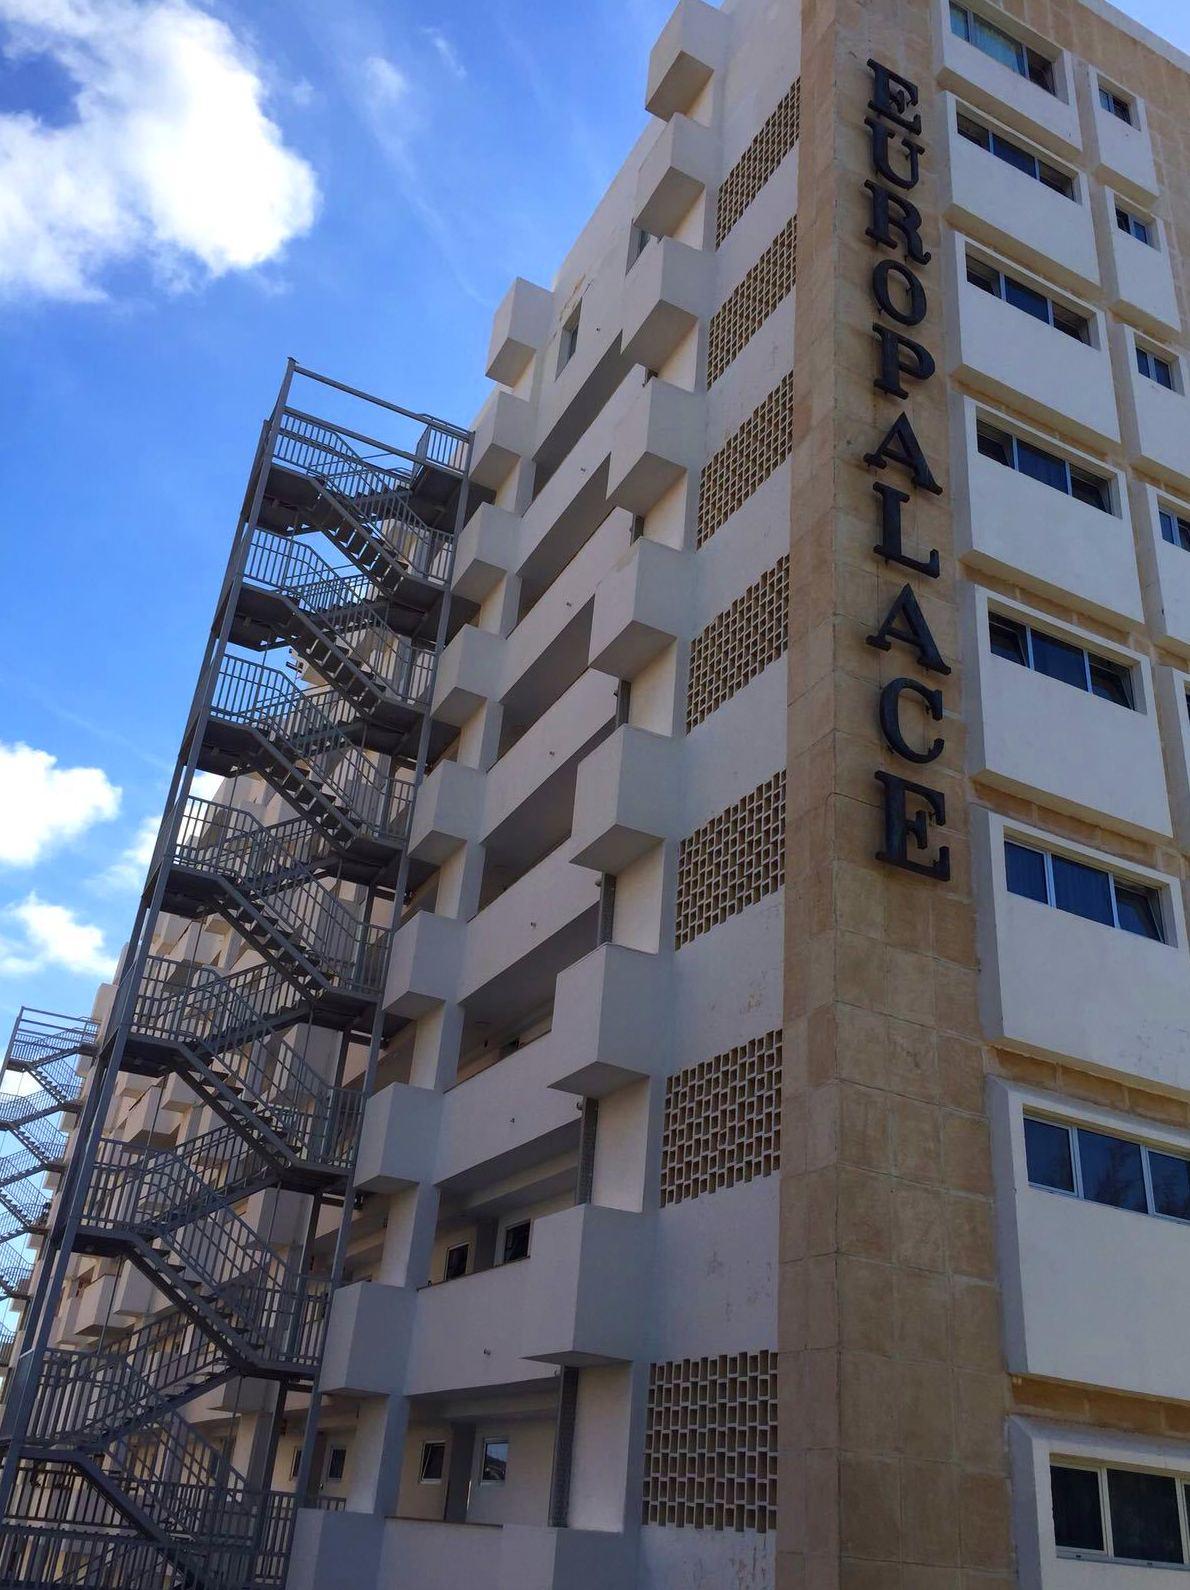 Rehabilitación y pintado de fachada. (Hotel Europalace, Gran Canaria)